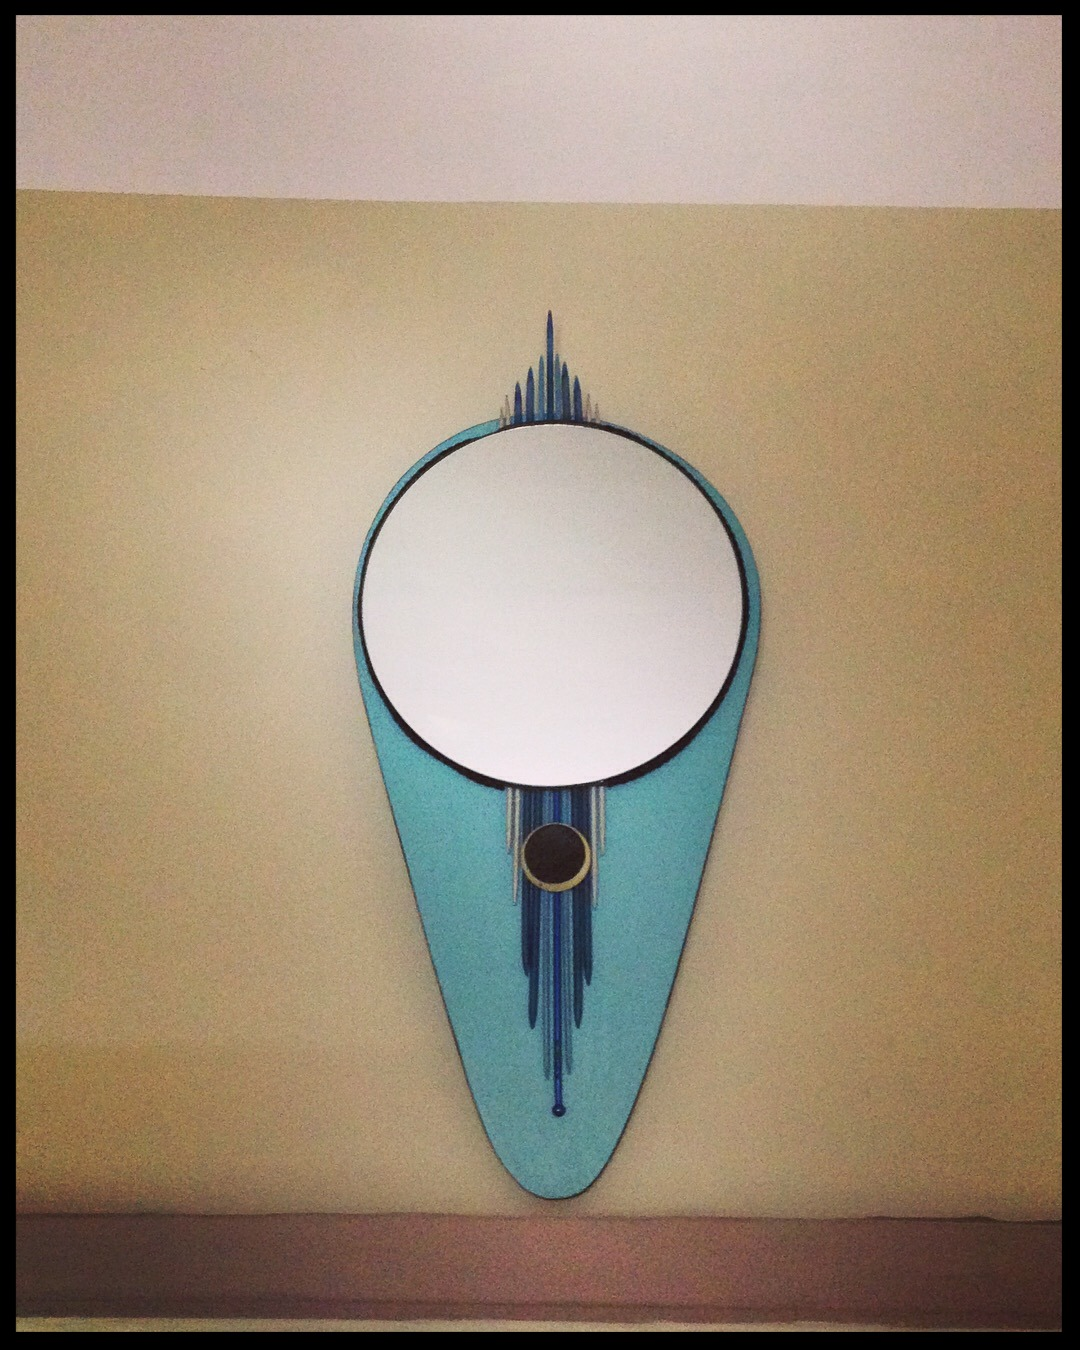 Miroir esprit année 50